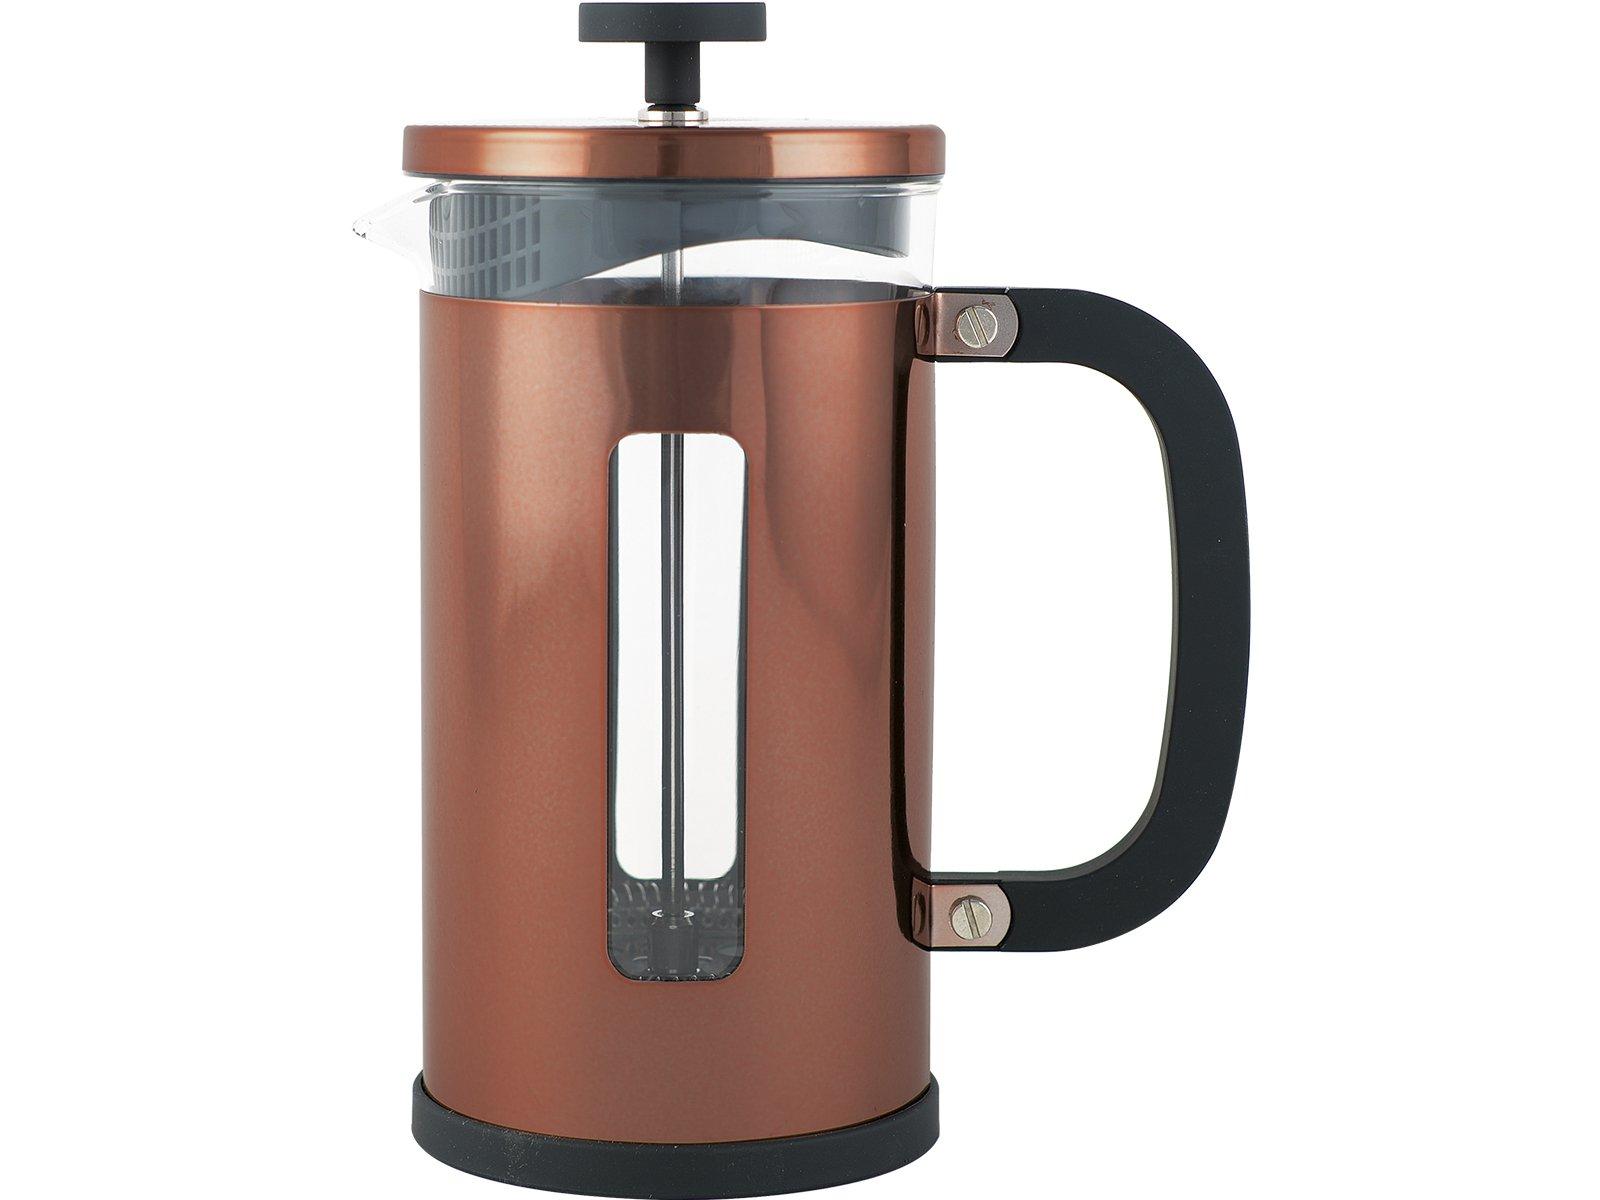 Creative Tops 1000 ml Pisa – Cafetera de émbolo, acabado en cobre, 8 tazas, con cuchara: Amazon.es: Hogar